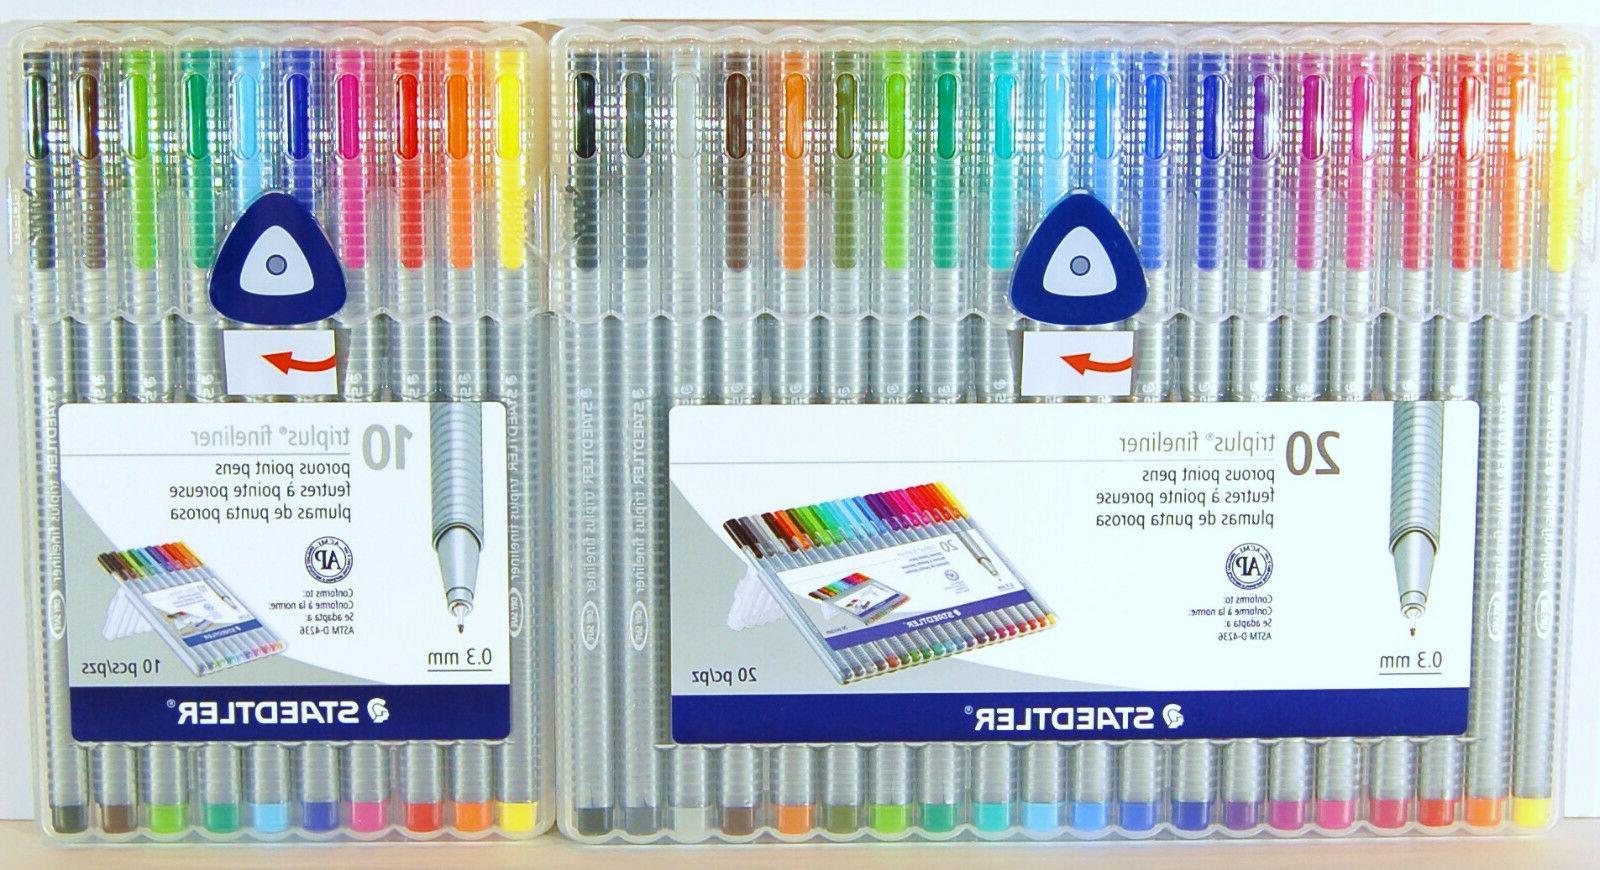 Staedtler Triplus Fineliner 0.3 mm Porous Point Pens 10 Colo